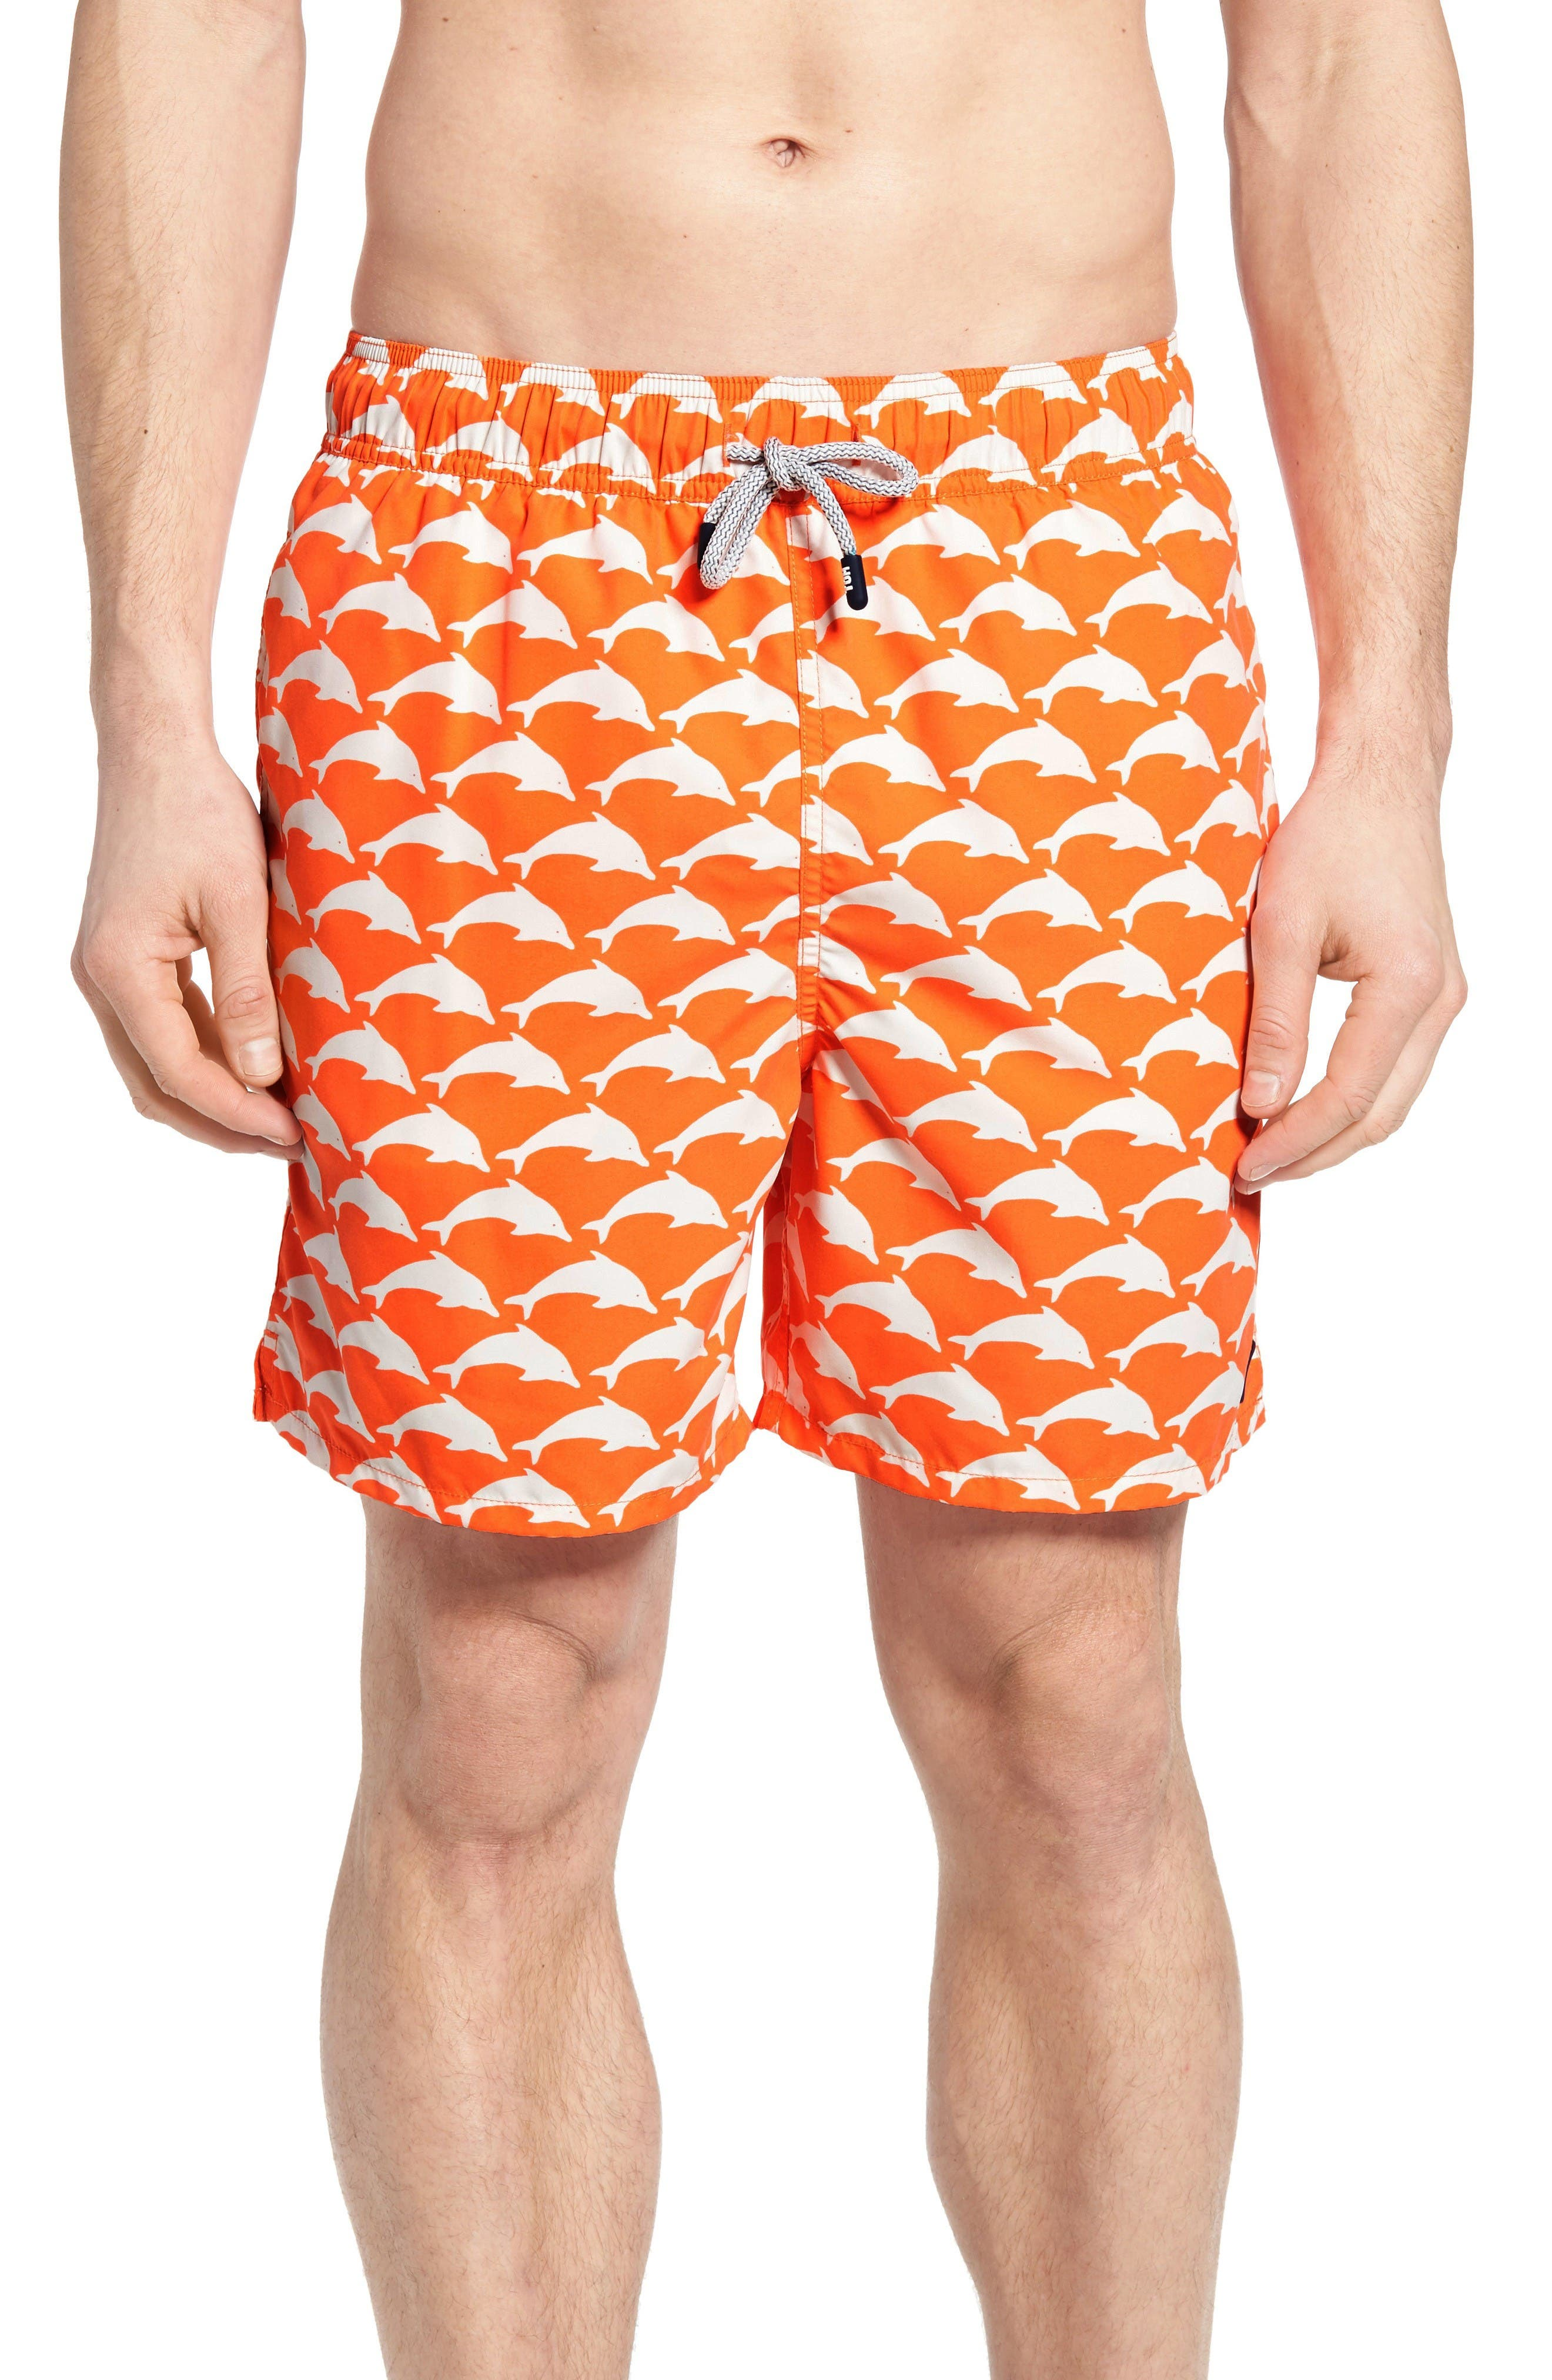 Dolphin Print Swim Trunks,                             Main thumbnail 1, color,                             Orange White